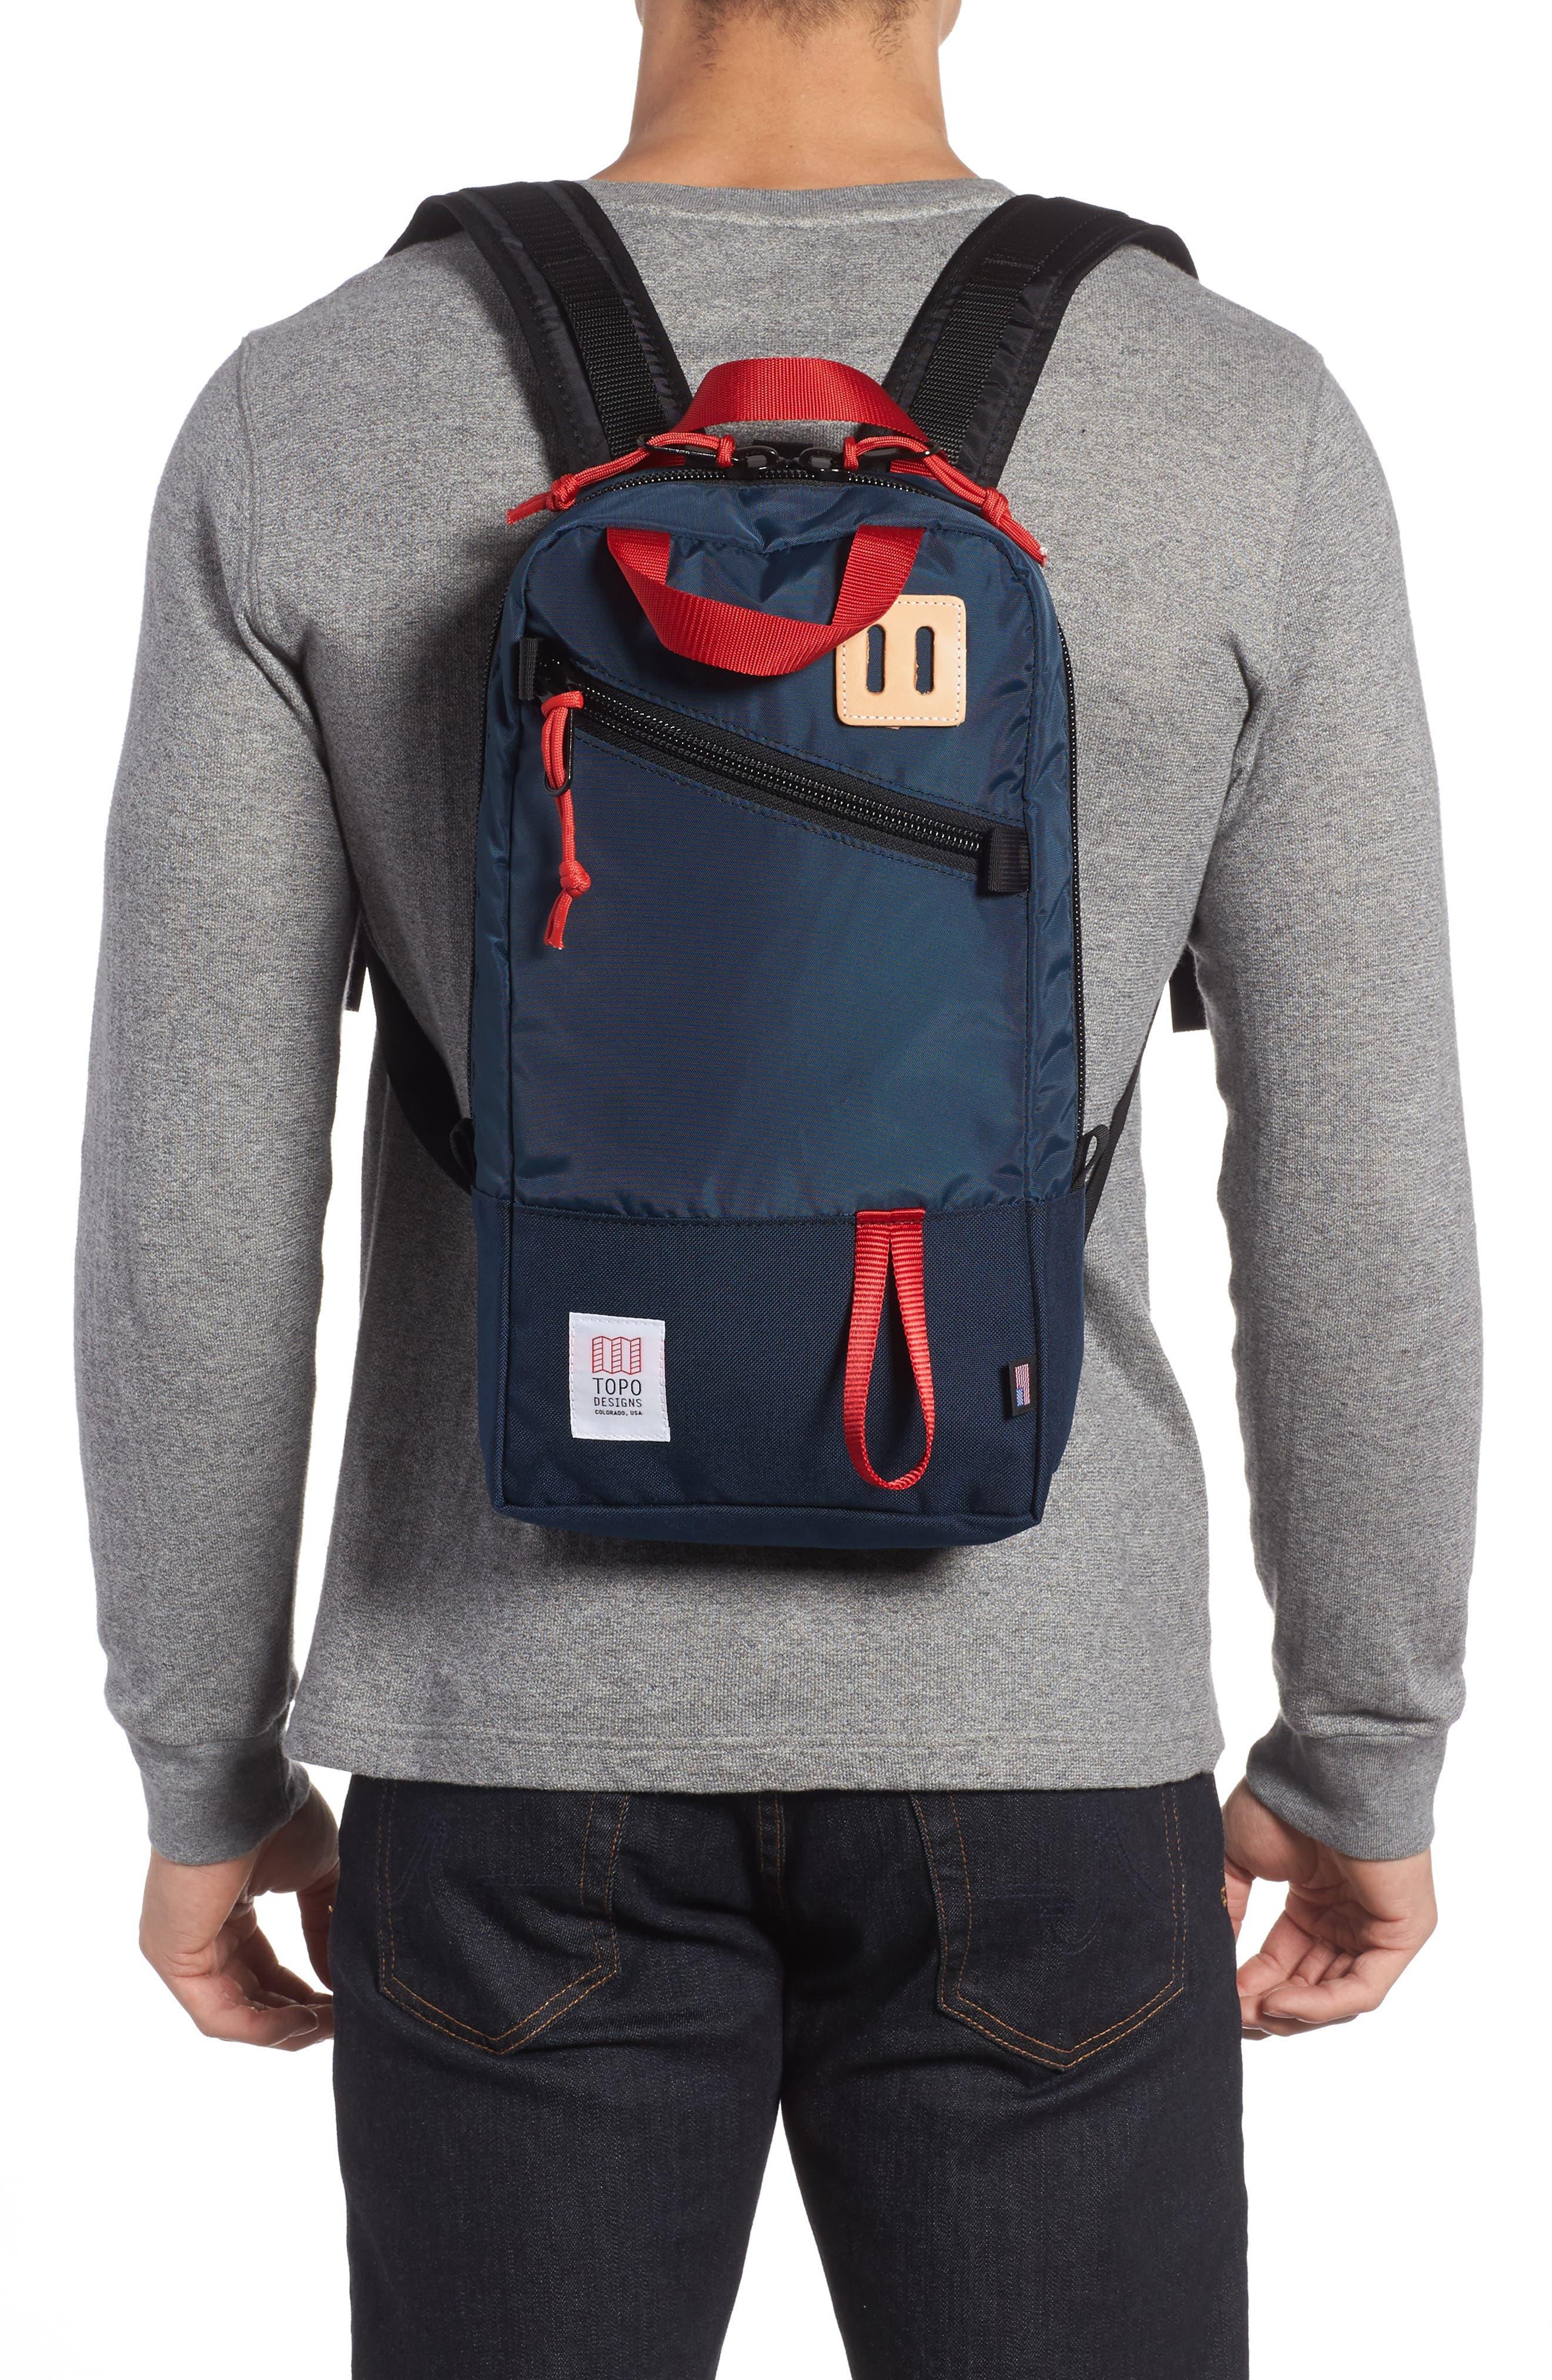 Trip Backpack,                             Alternate thumbnail 2, color,                             Navy